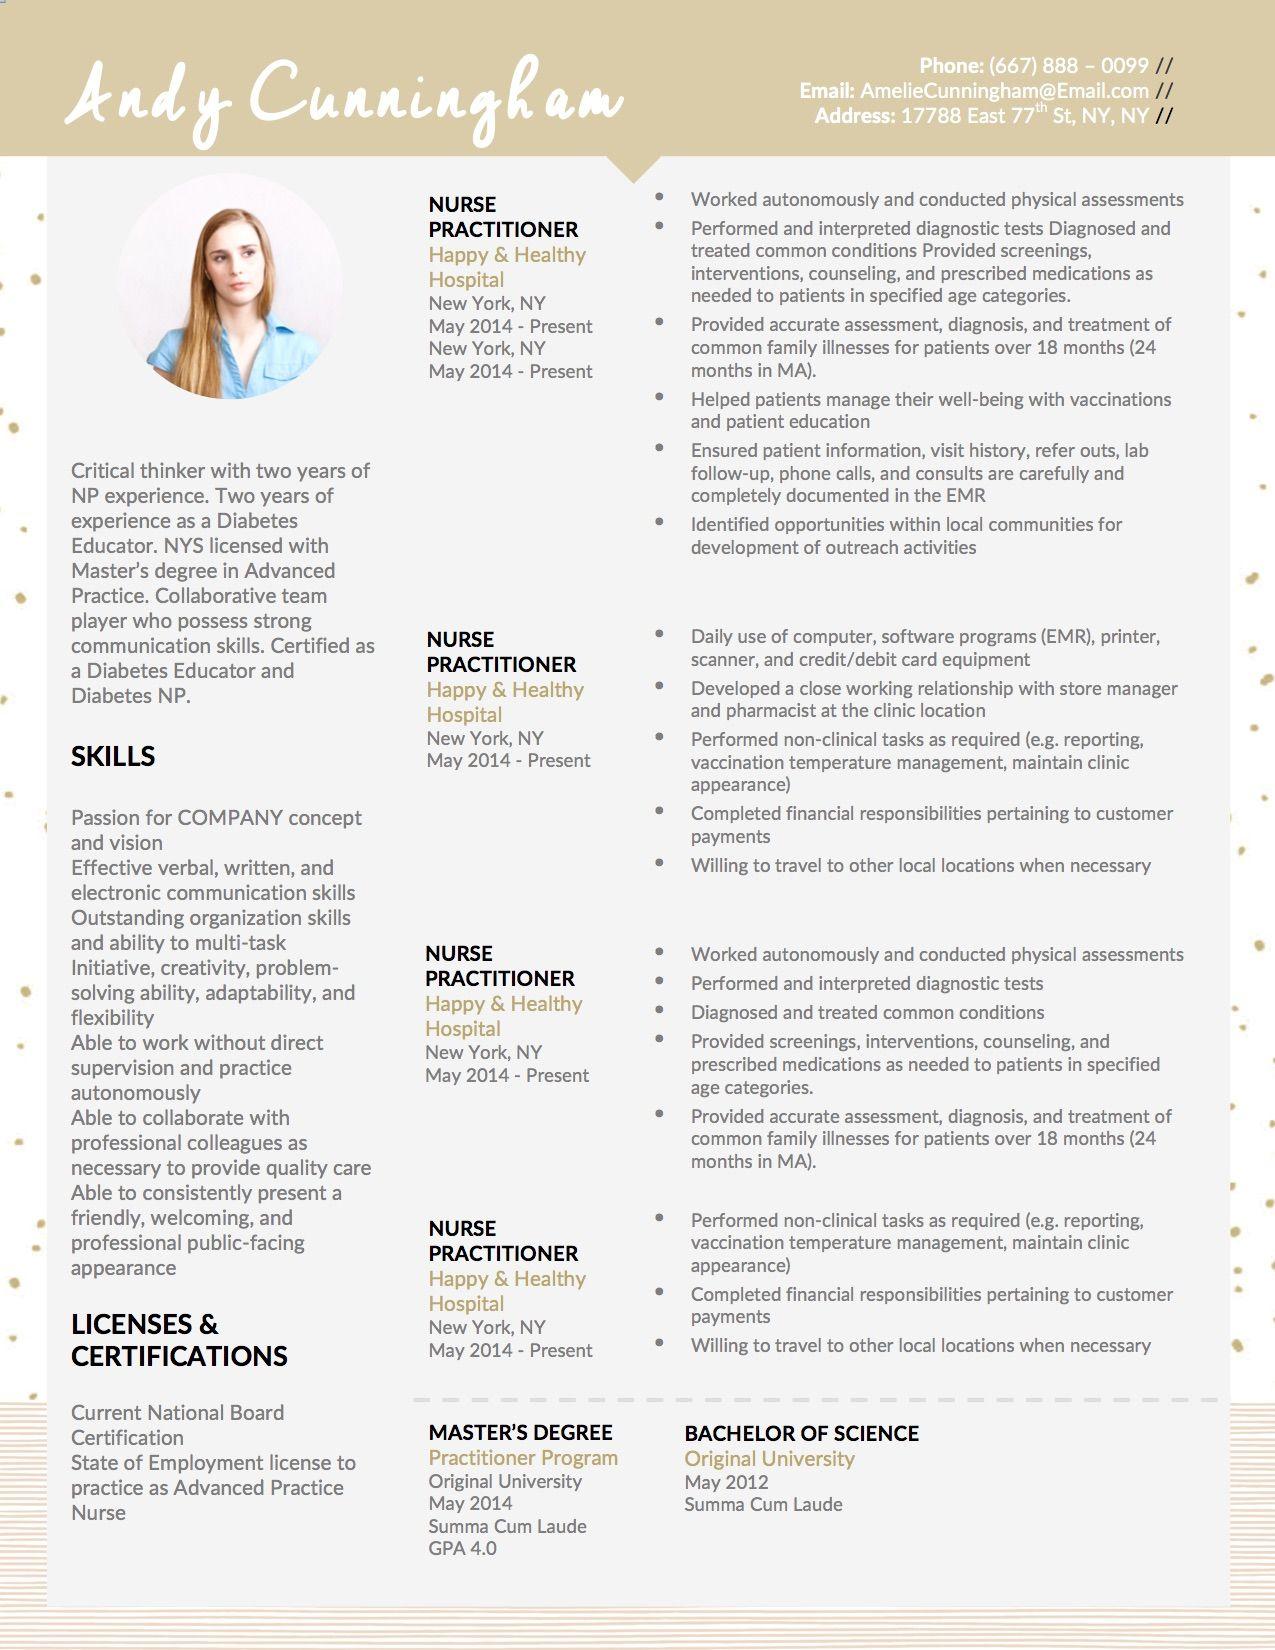 andy cunningham ii nurse practitioner resume